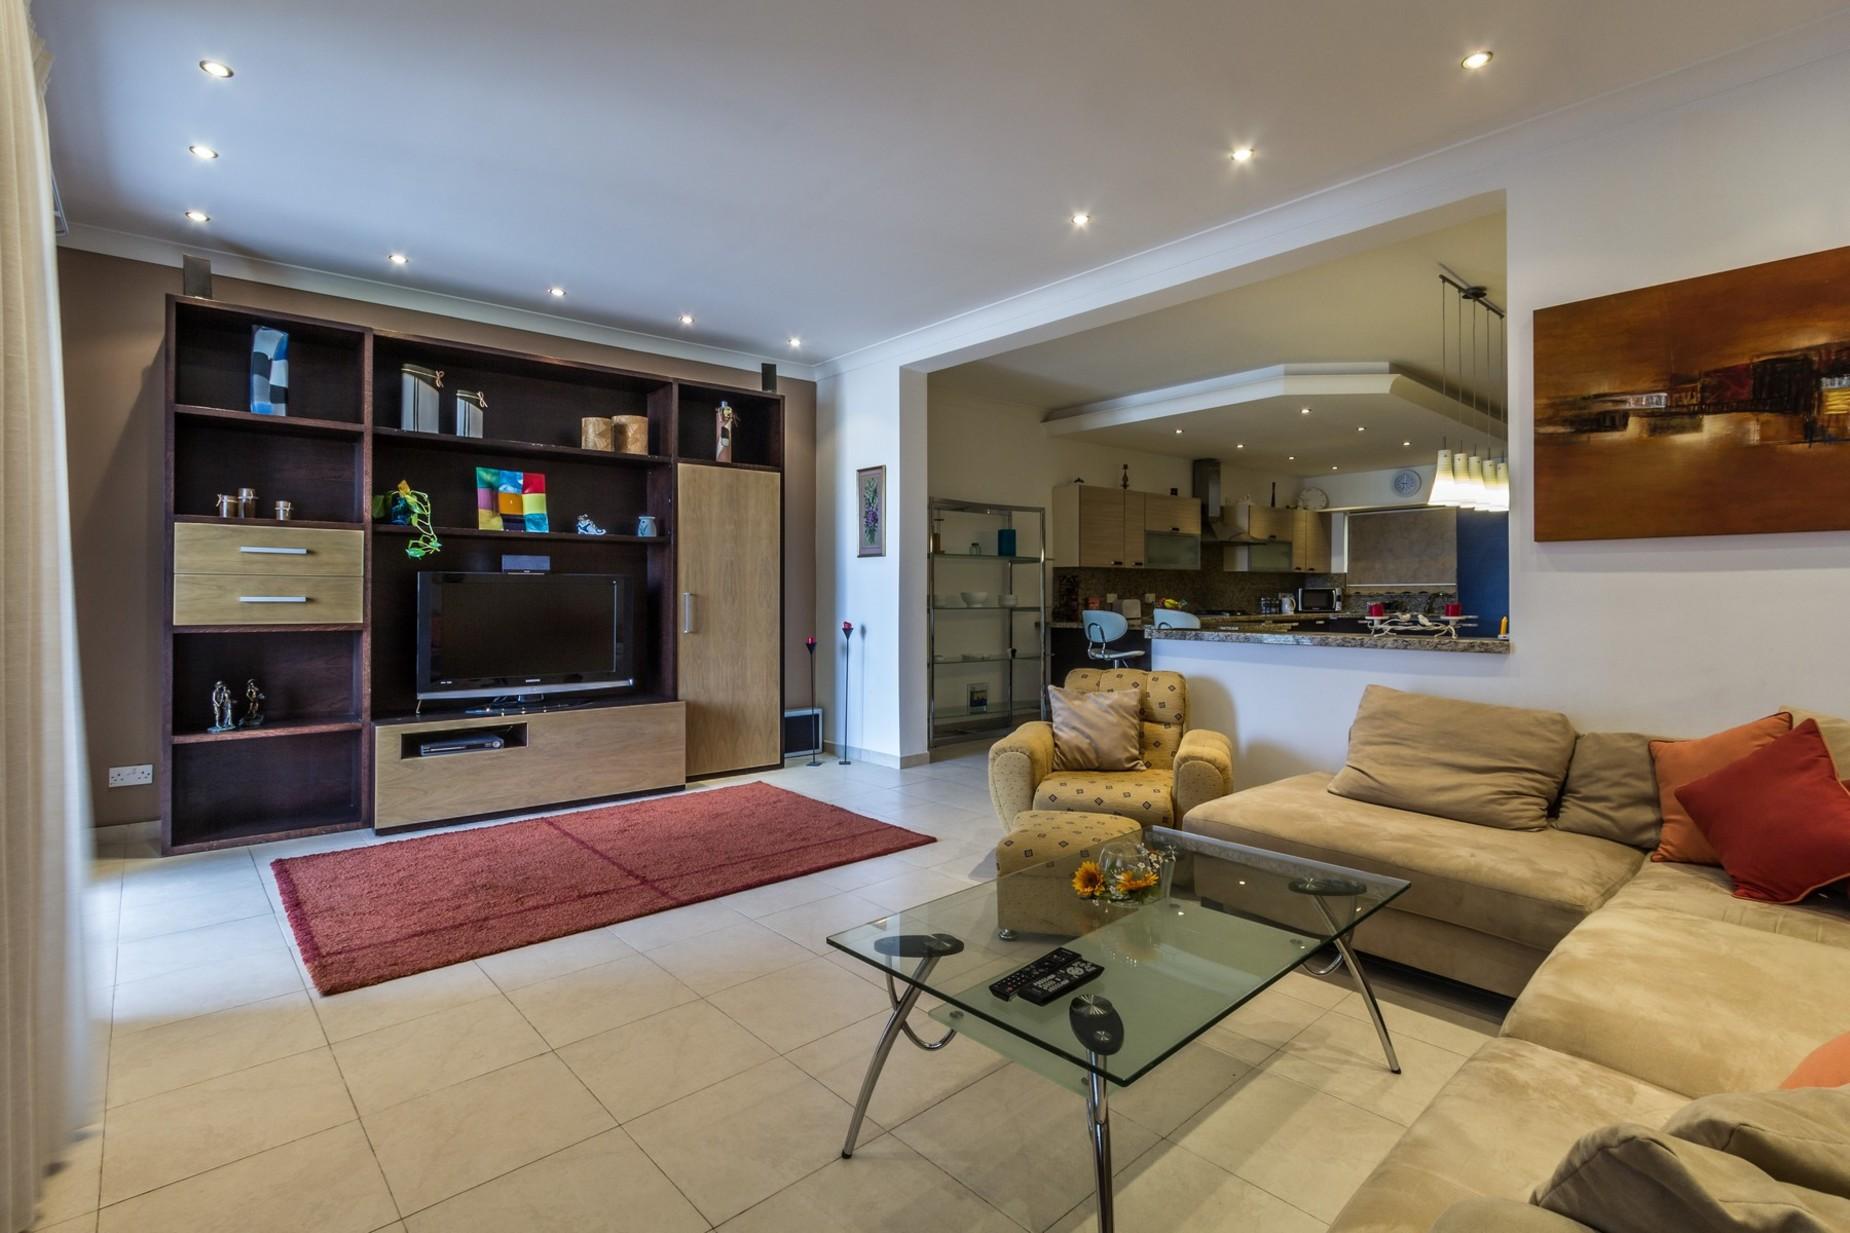 3 bed Apartment For Sale in Qawra, Qawra - thumb 3